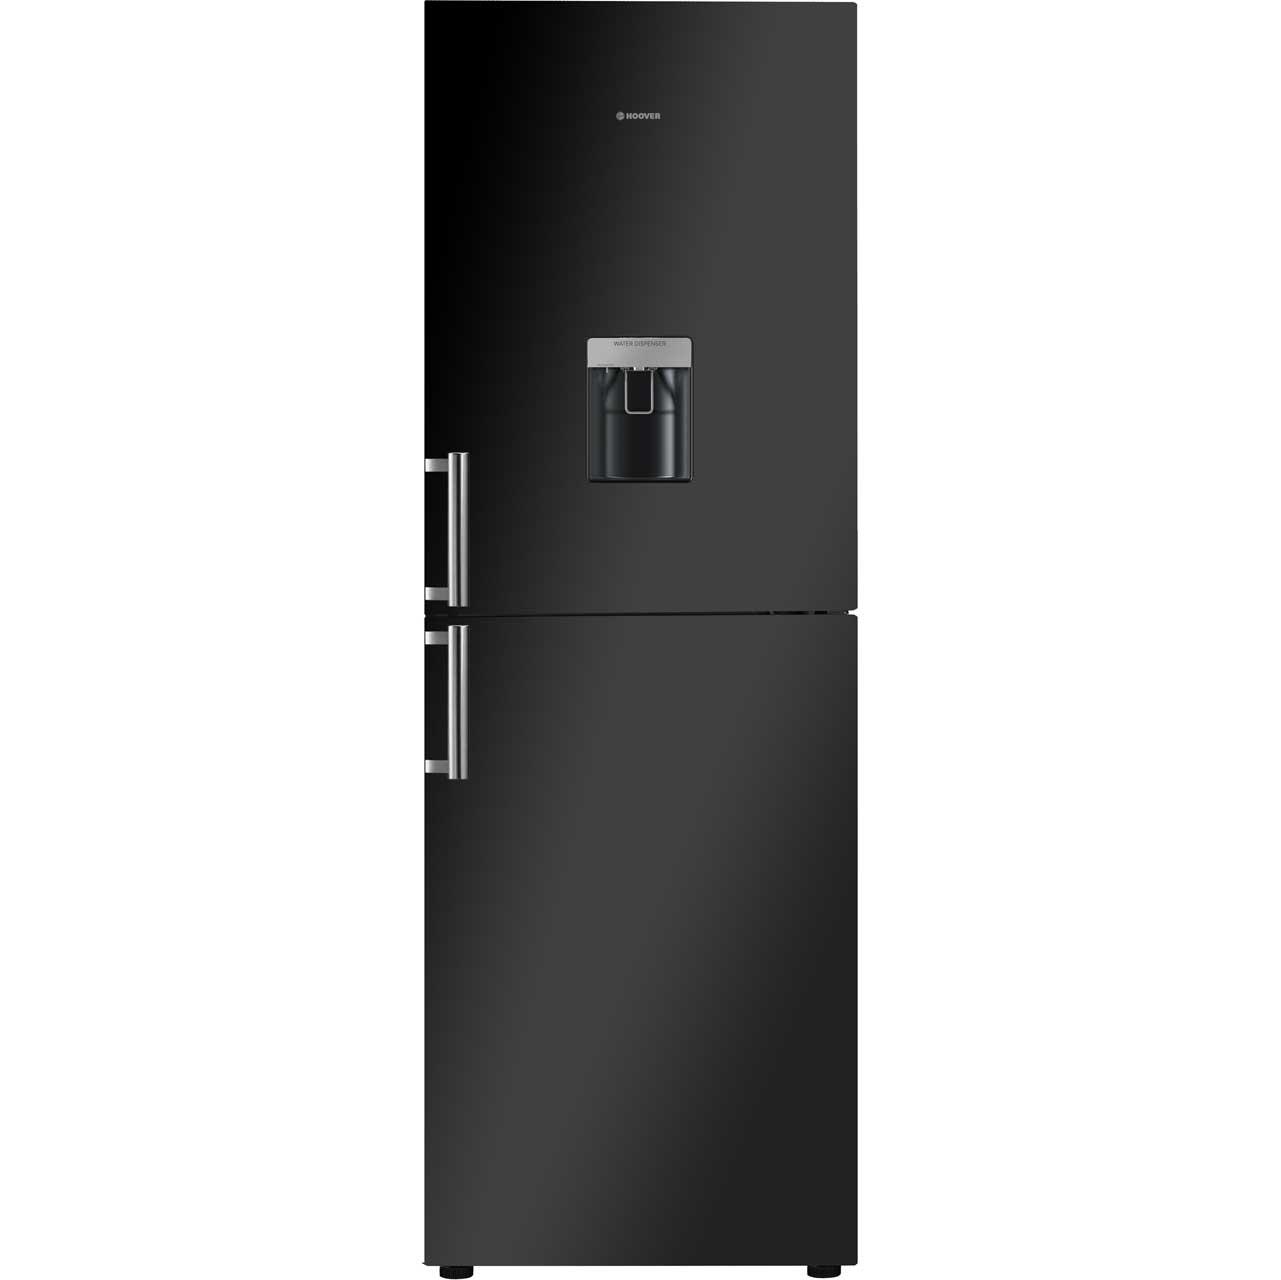 Hoover HVBN6182BWDK Free Standing Fridge Freezer Frost Free in Black